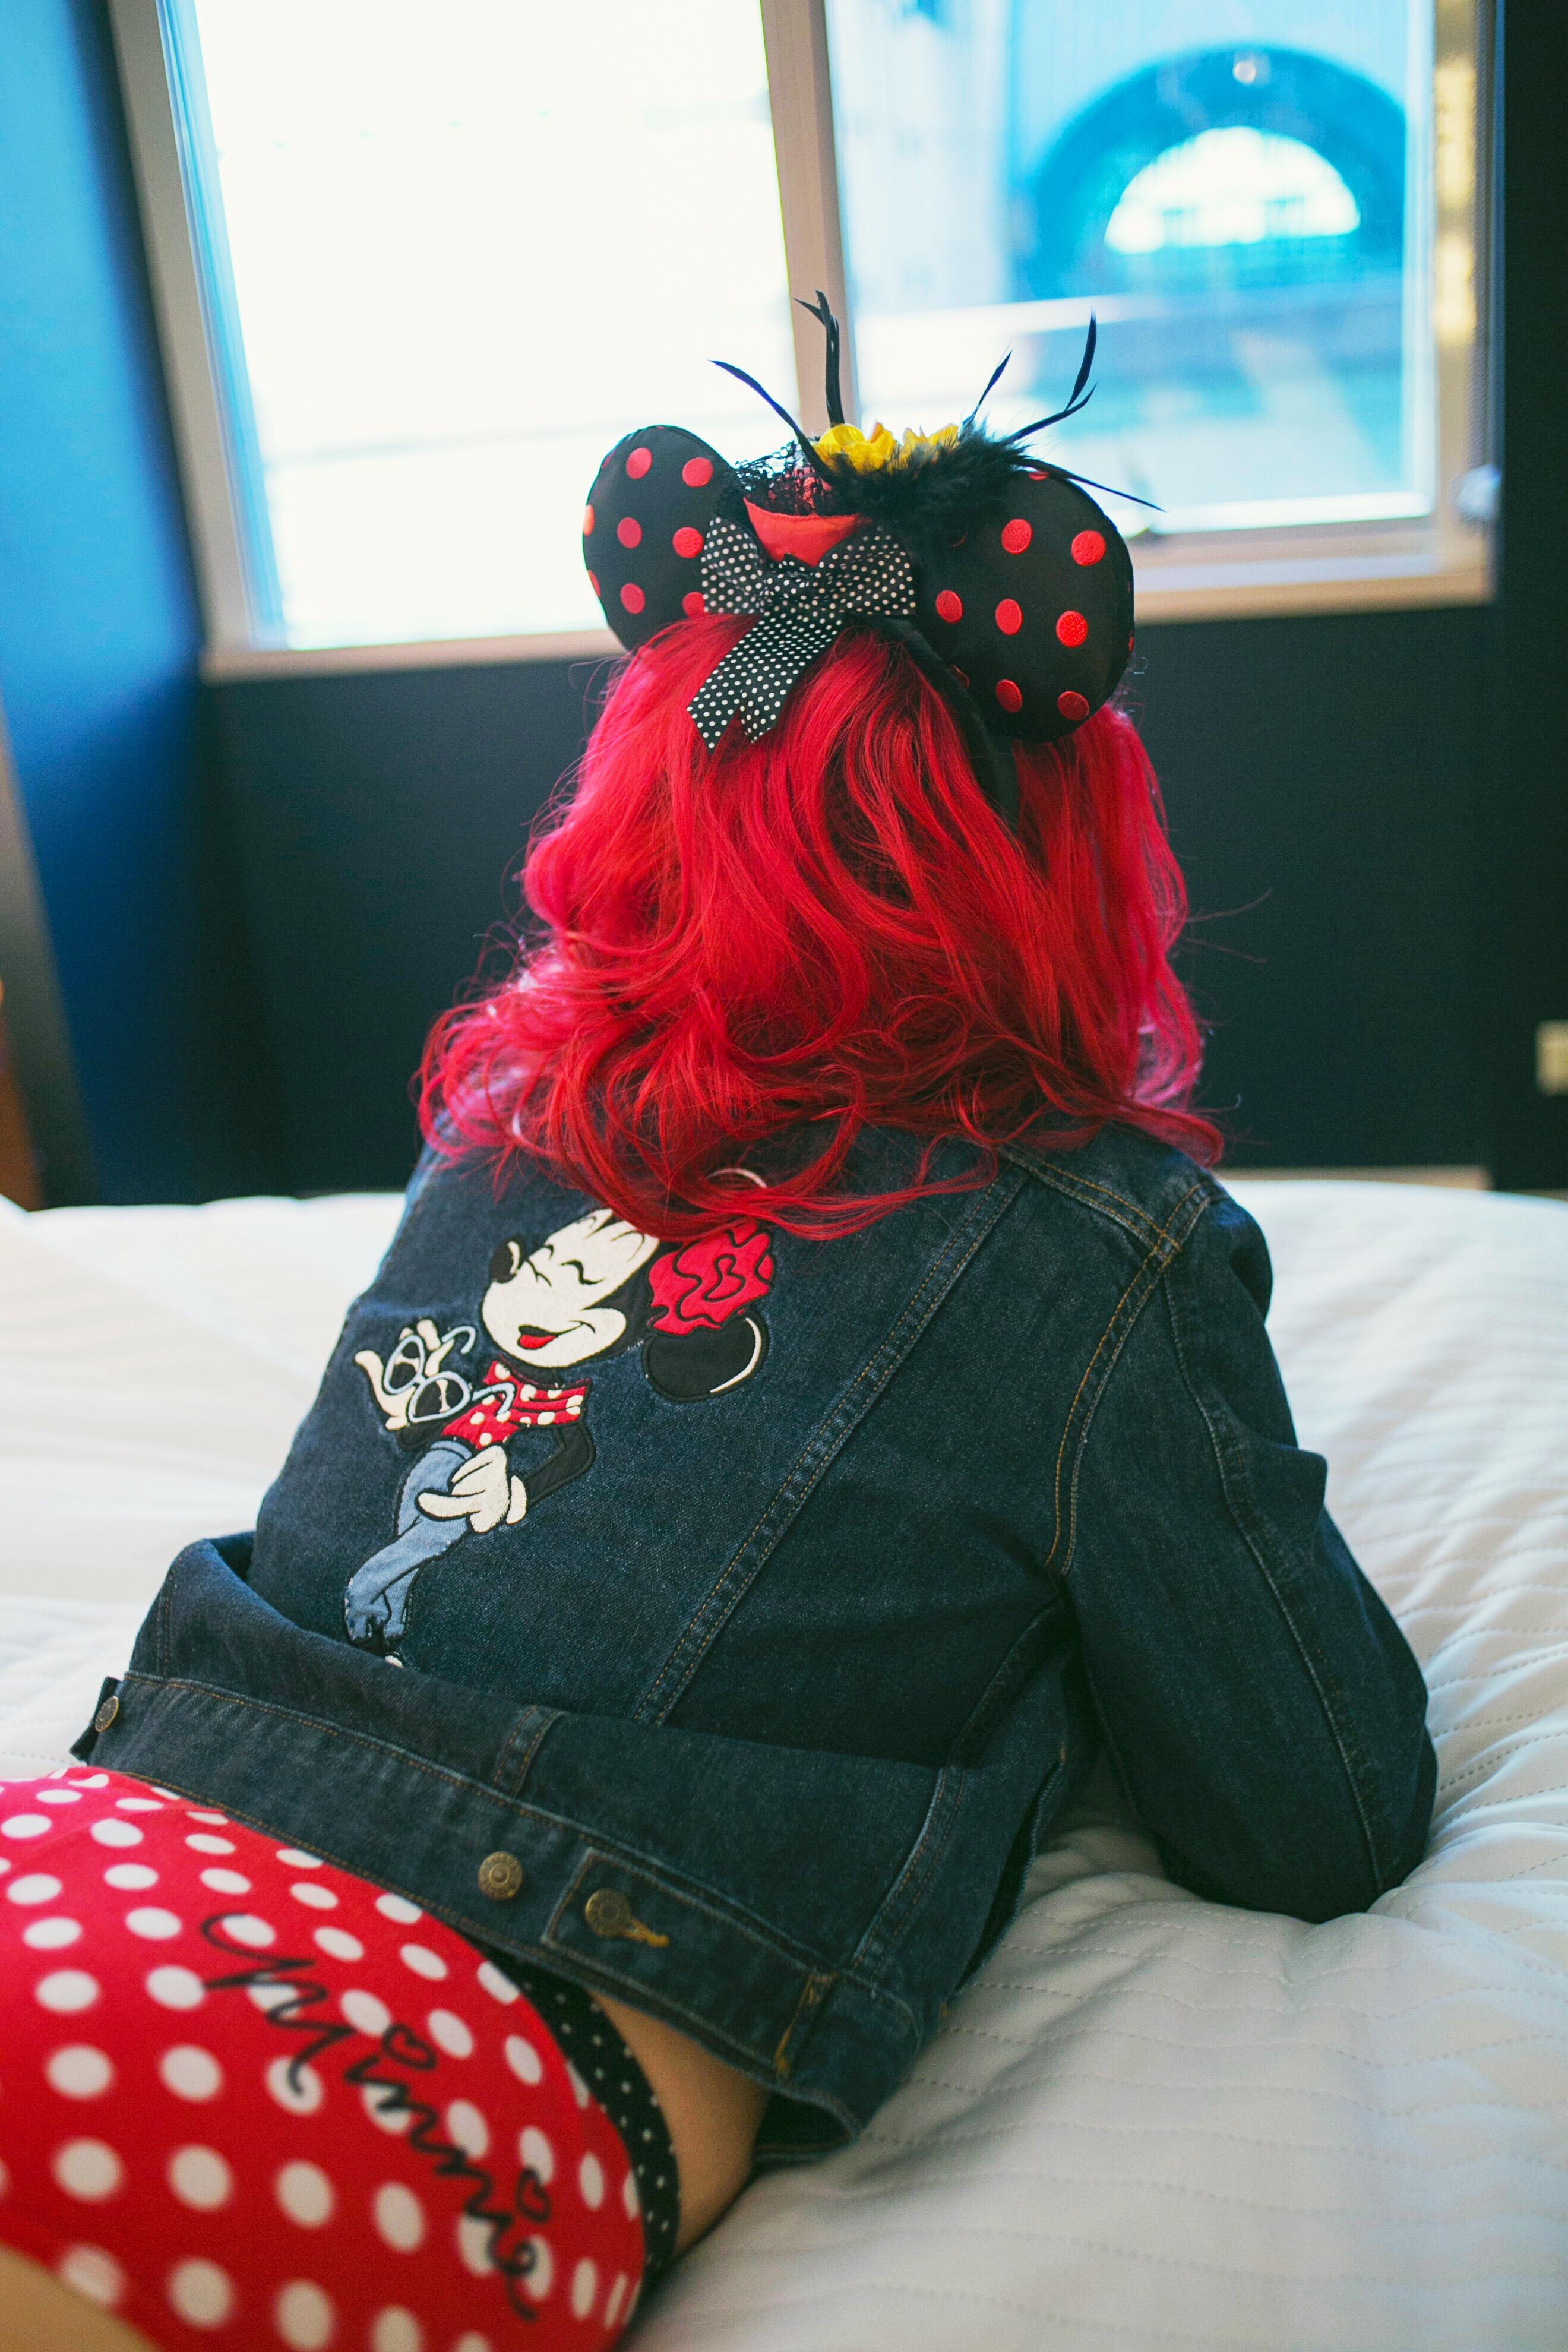 Minnie Mouse Inspired Fashion, Minnie Mouse Style, Minnie Mouse Fashion, Minnie Mouse Clothing, Vintage, Rockabilly Disney